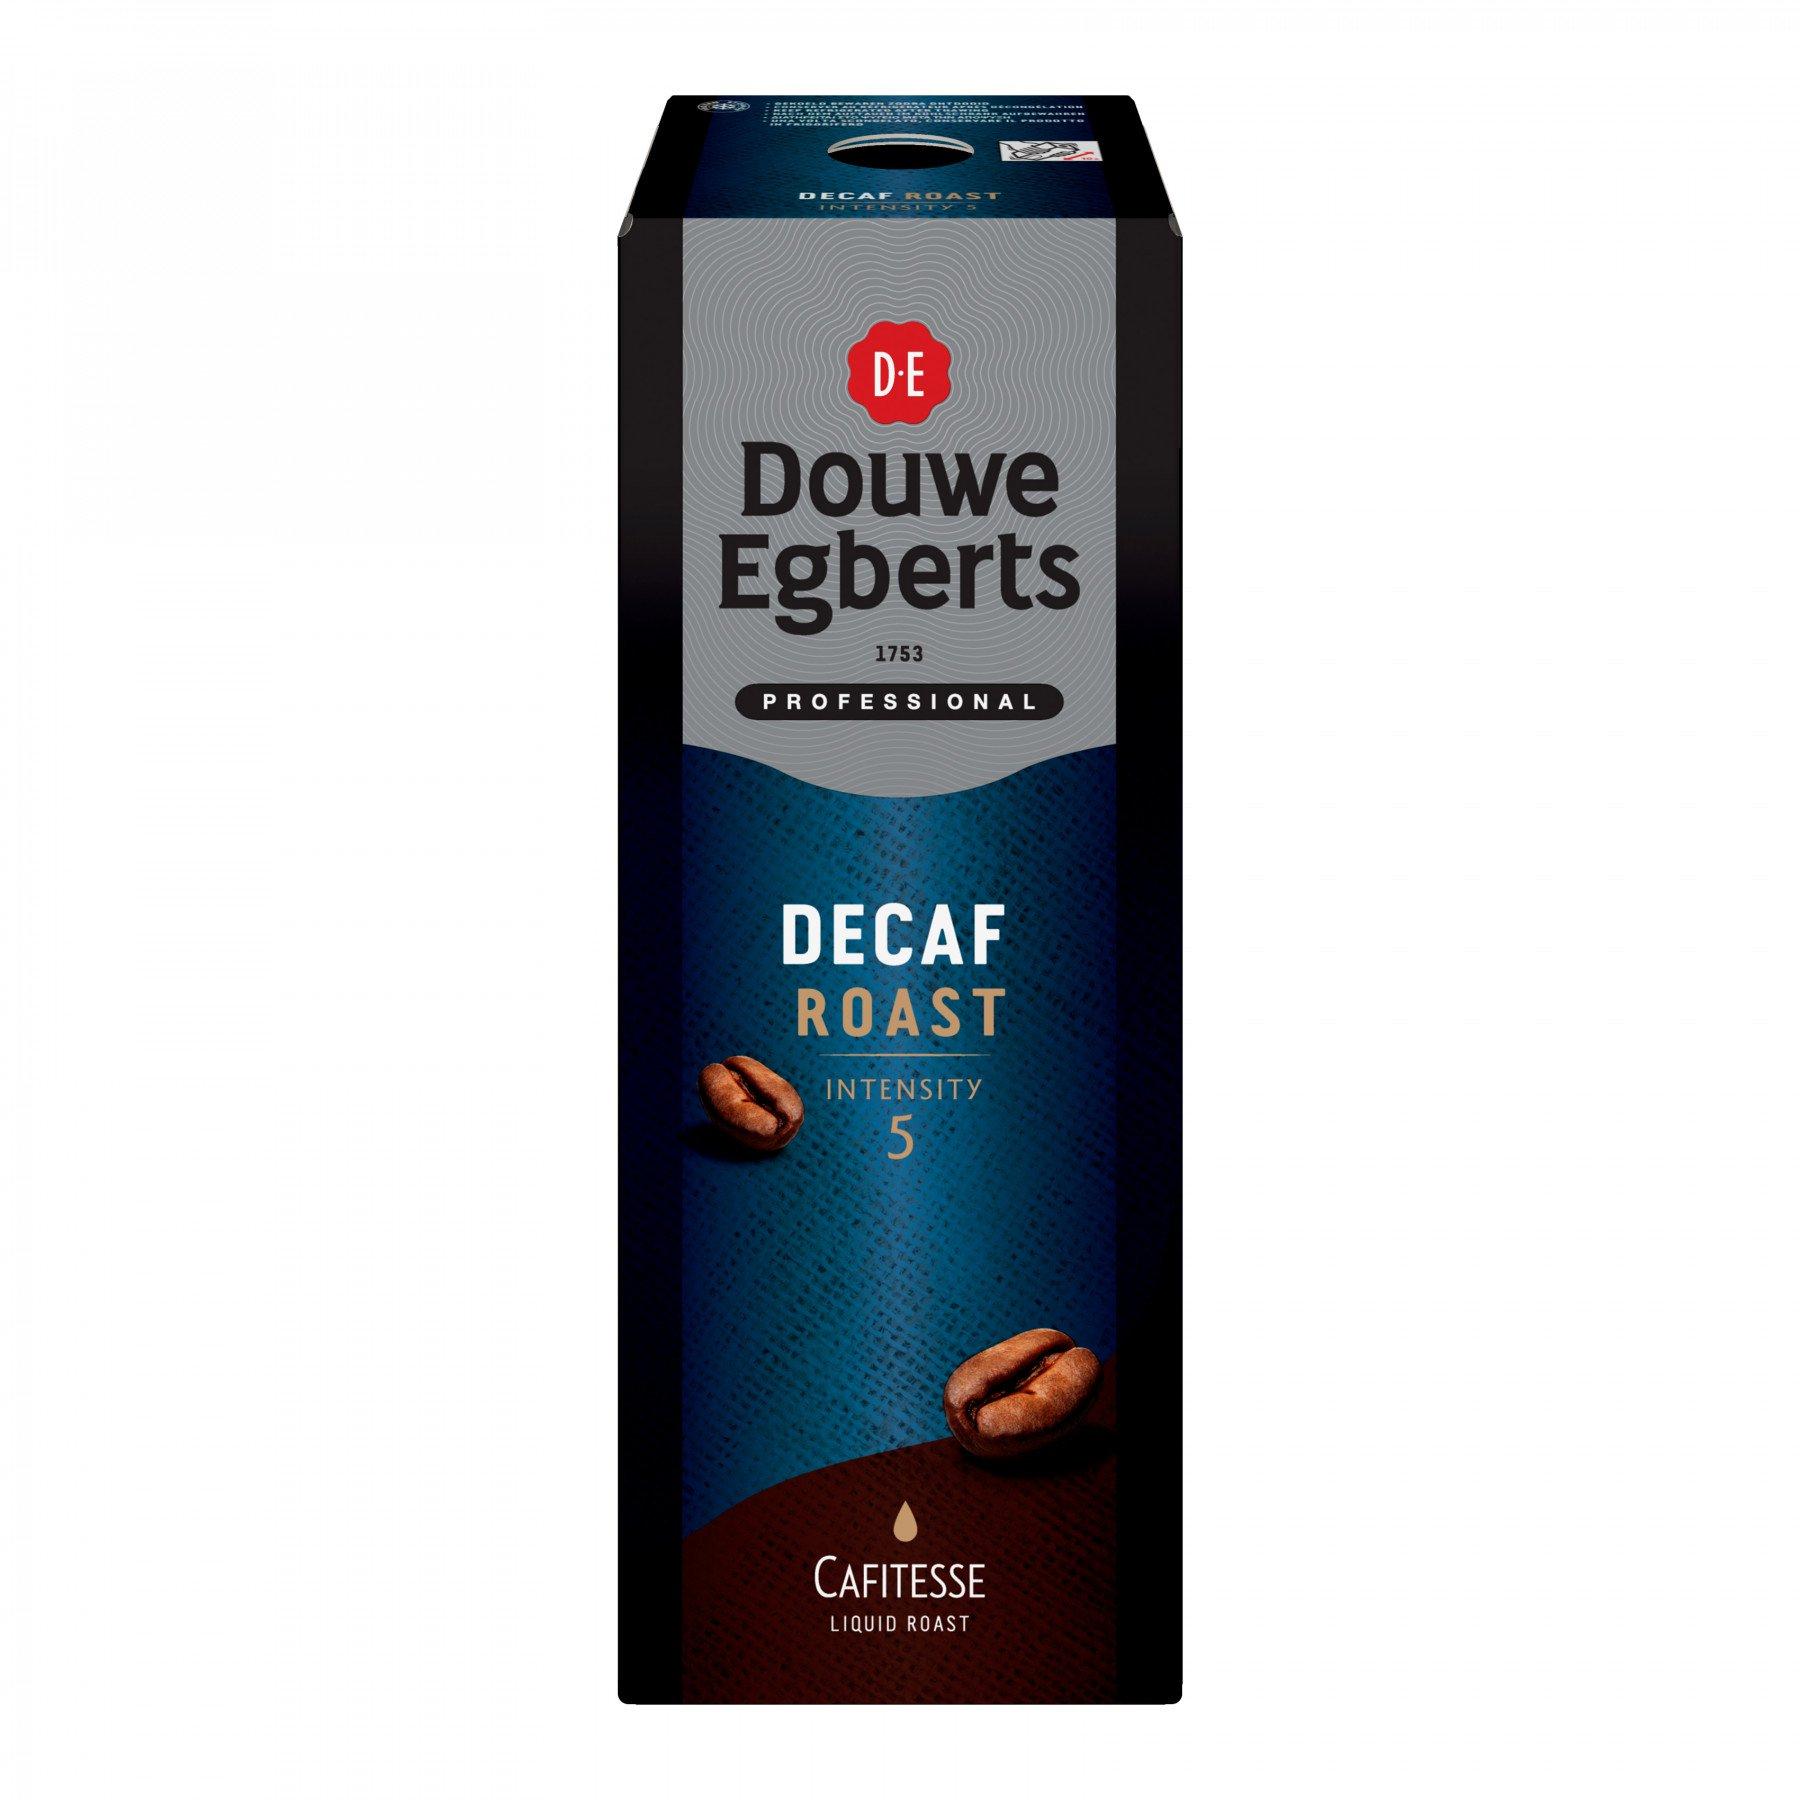 Douwe Egberts   Cafitesse DéCaf Roast   Pak 1 x 1,25 liter